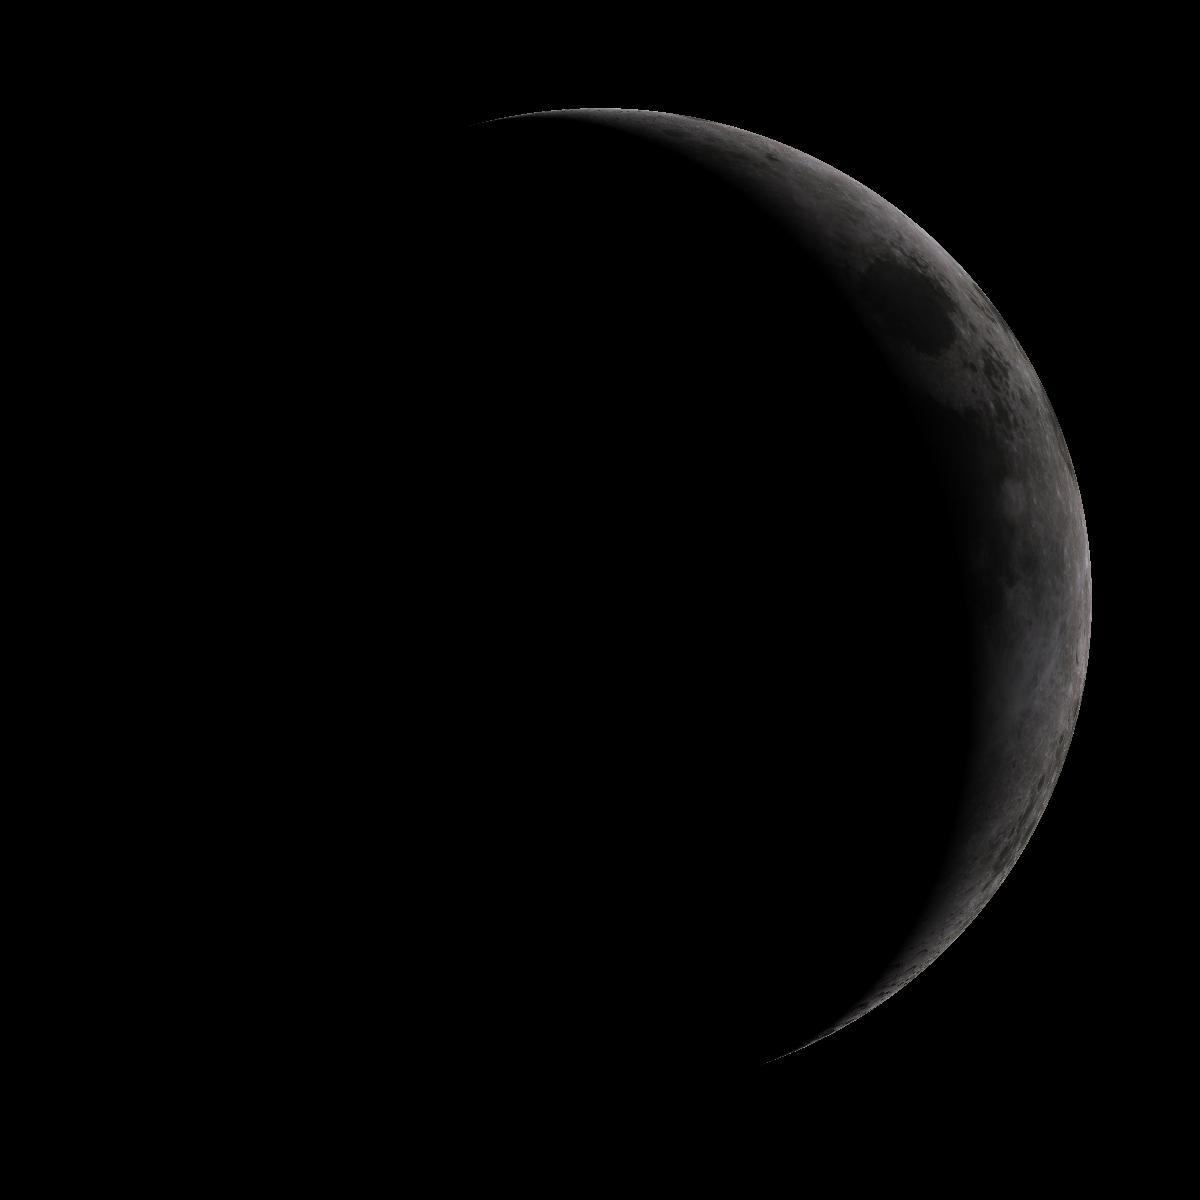 Lune du 6 juillet 2019